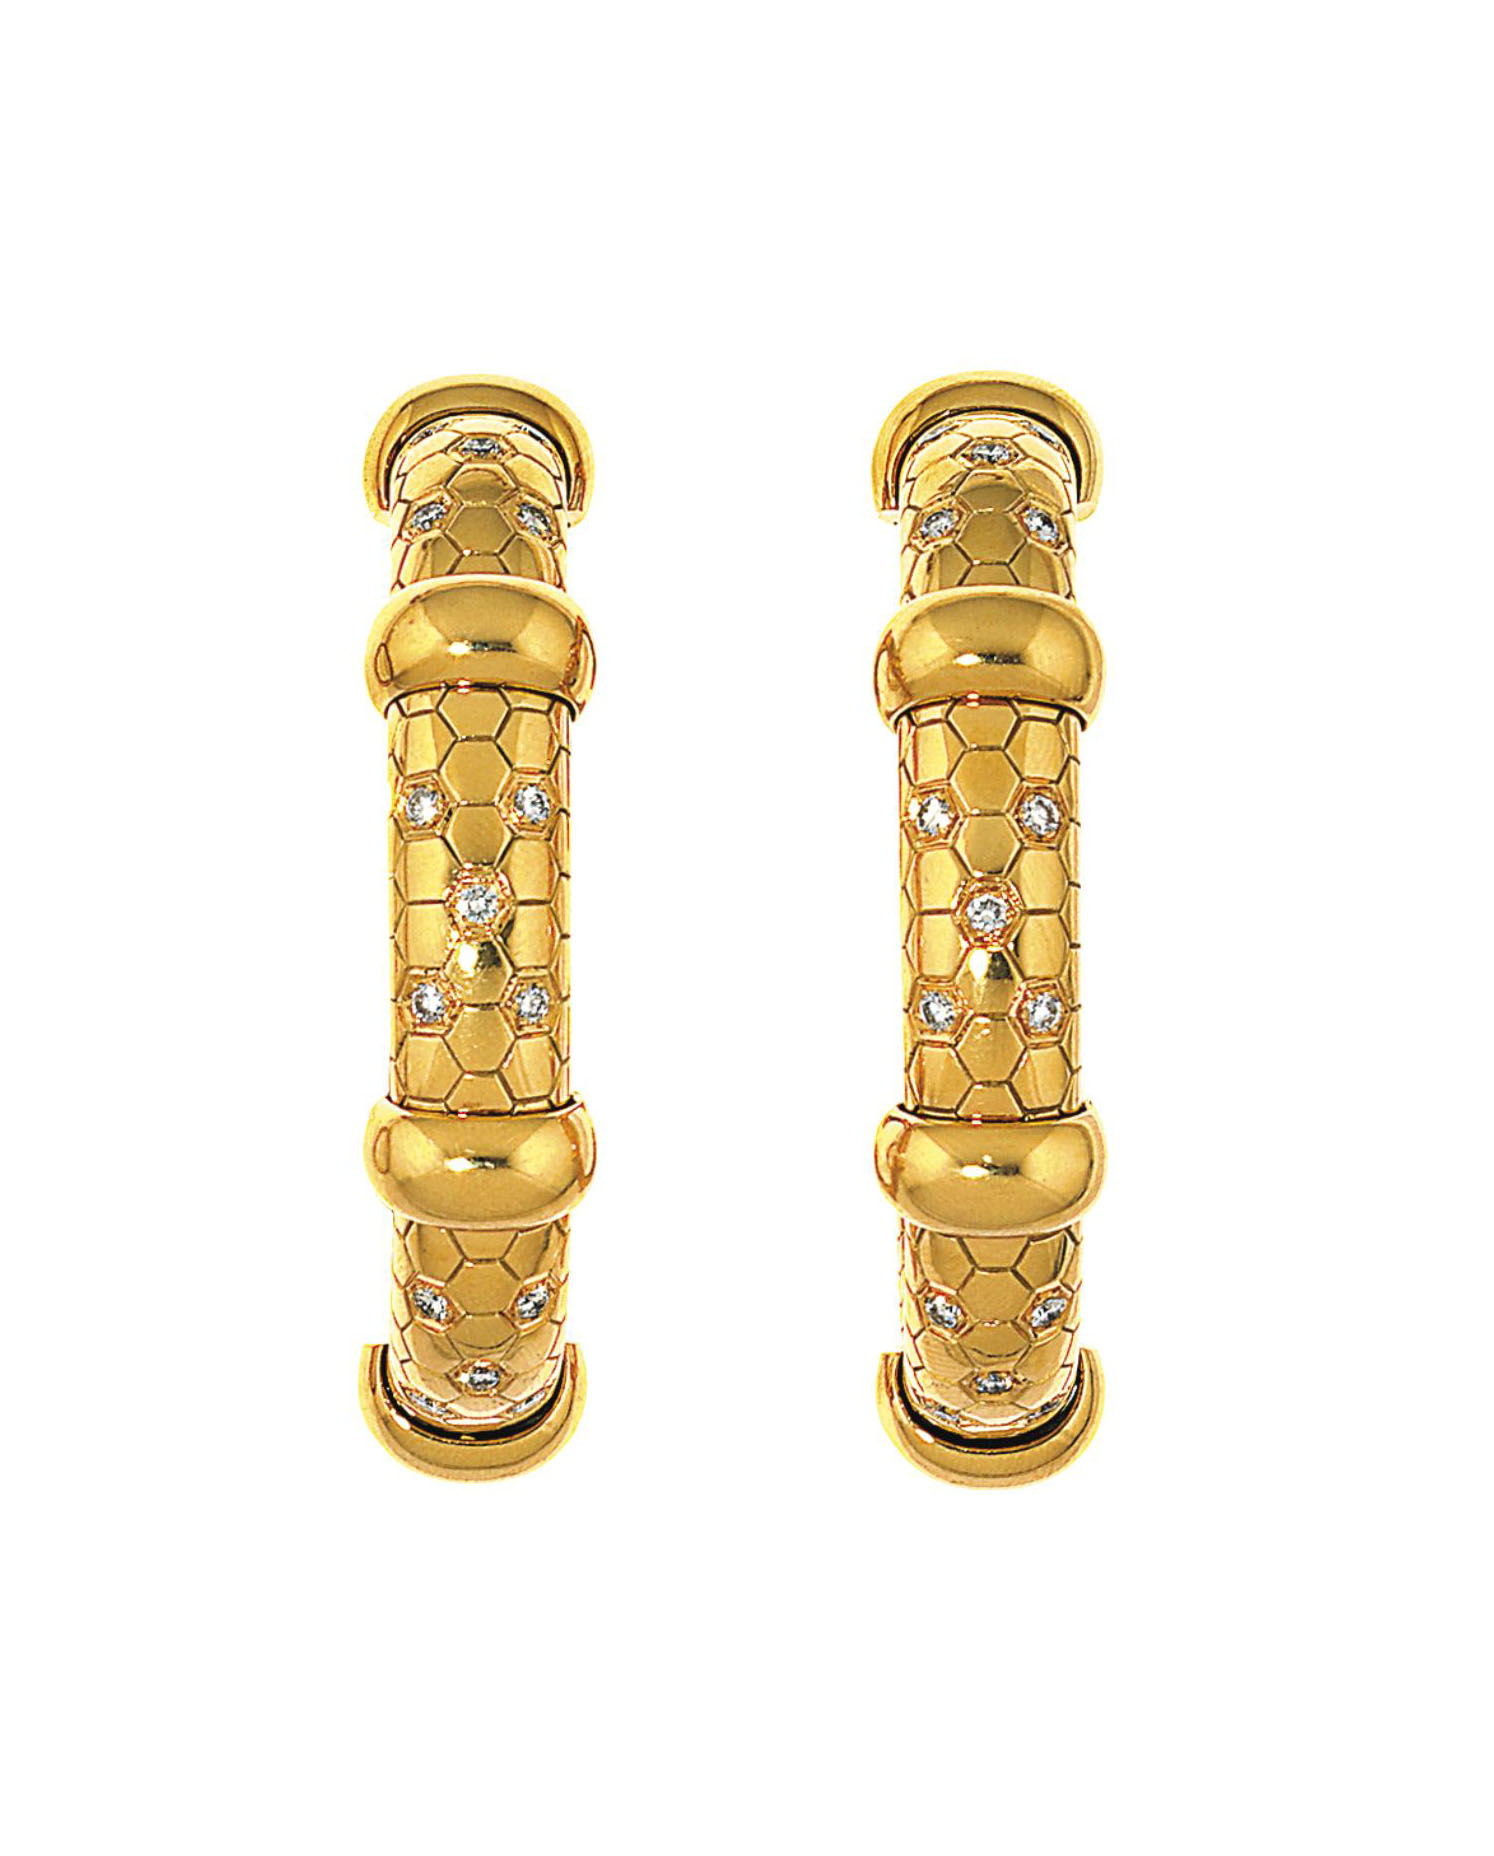 Two diamond-set bangles, by O J Perrin